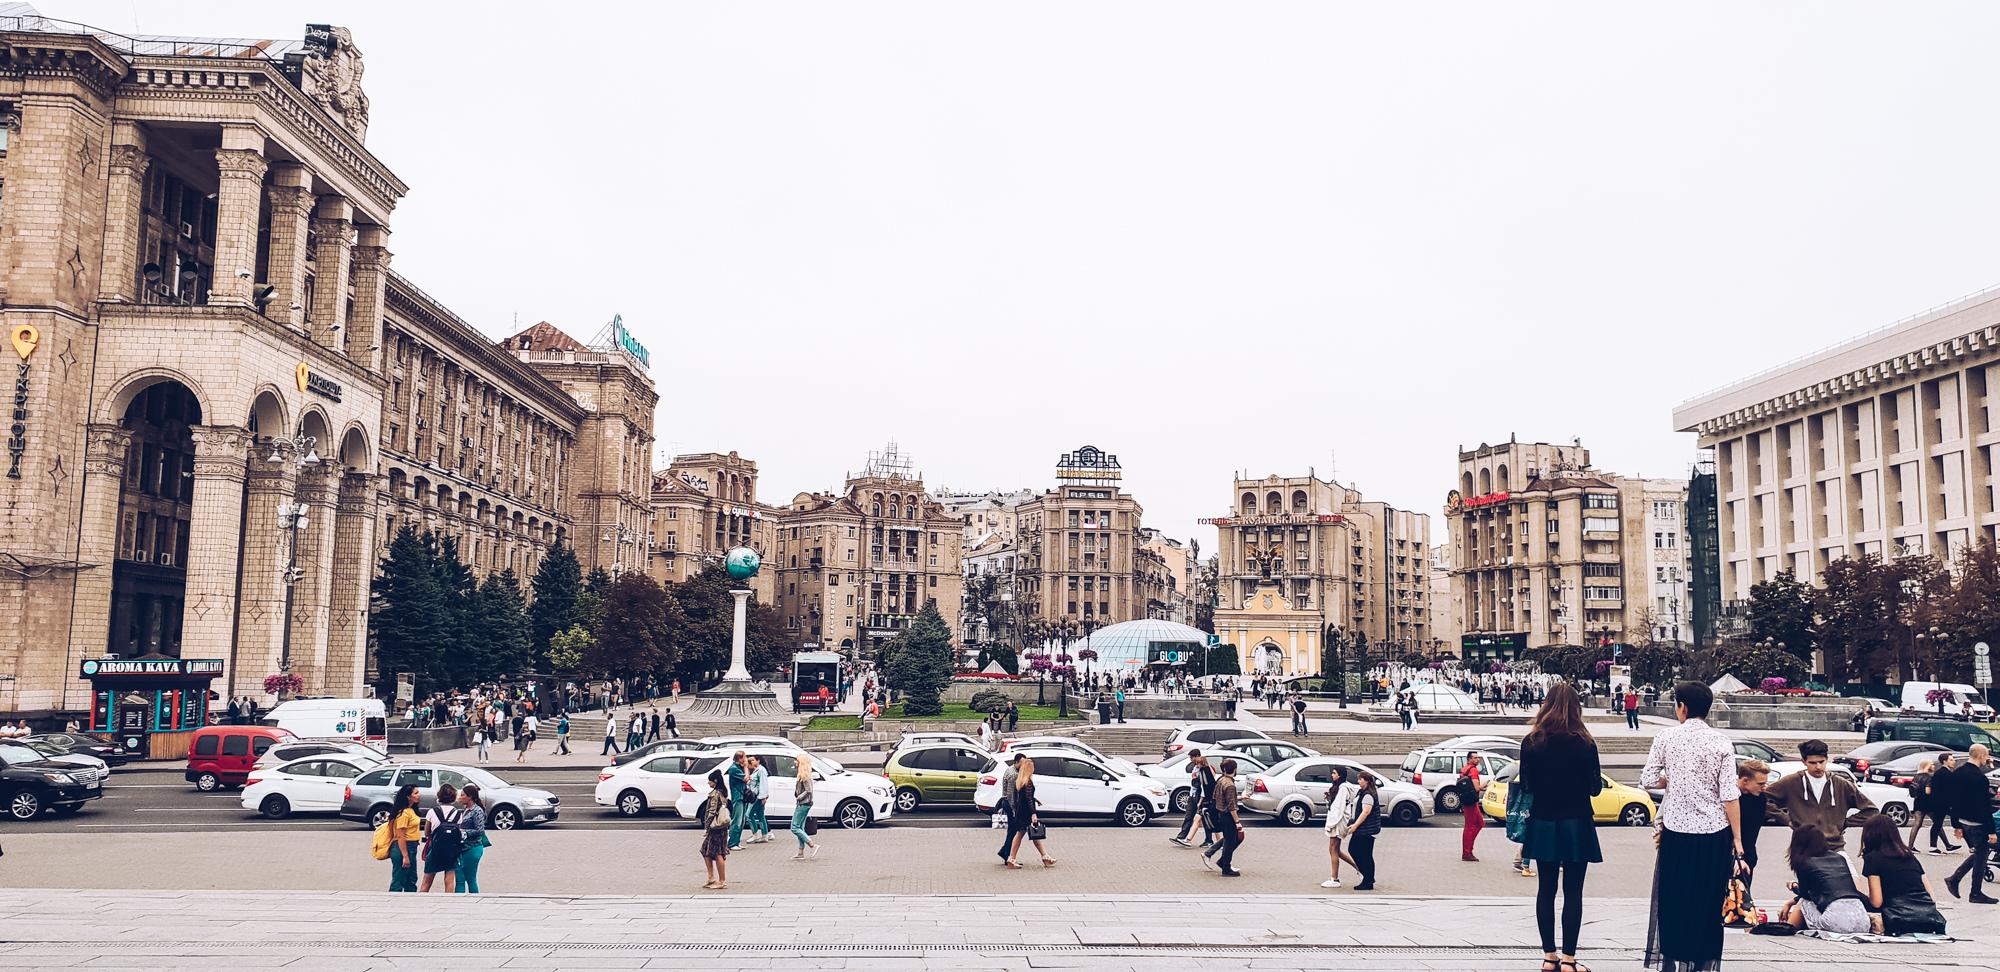 kiev kyiv ukraine quitealooker quite a looker travel roamtheplanet tasteintravel explore holiday trip